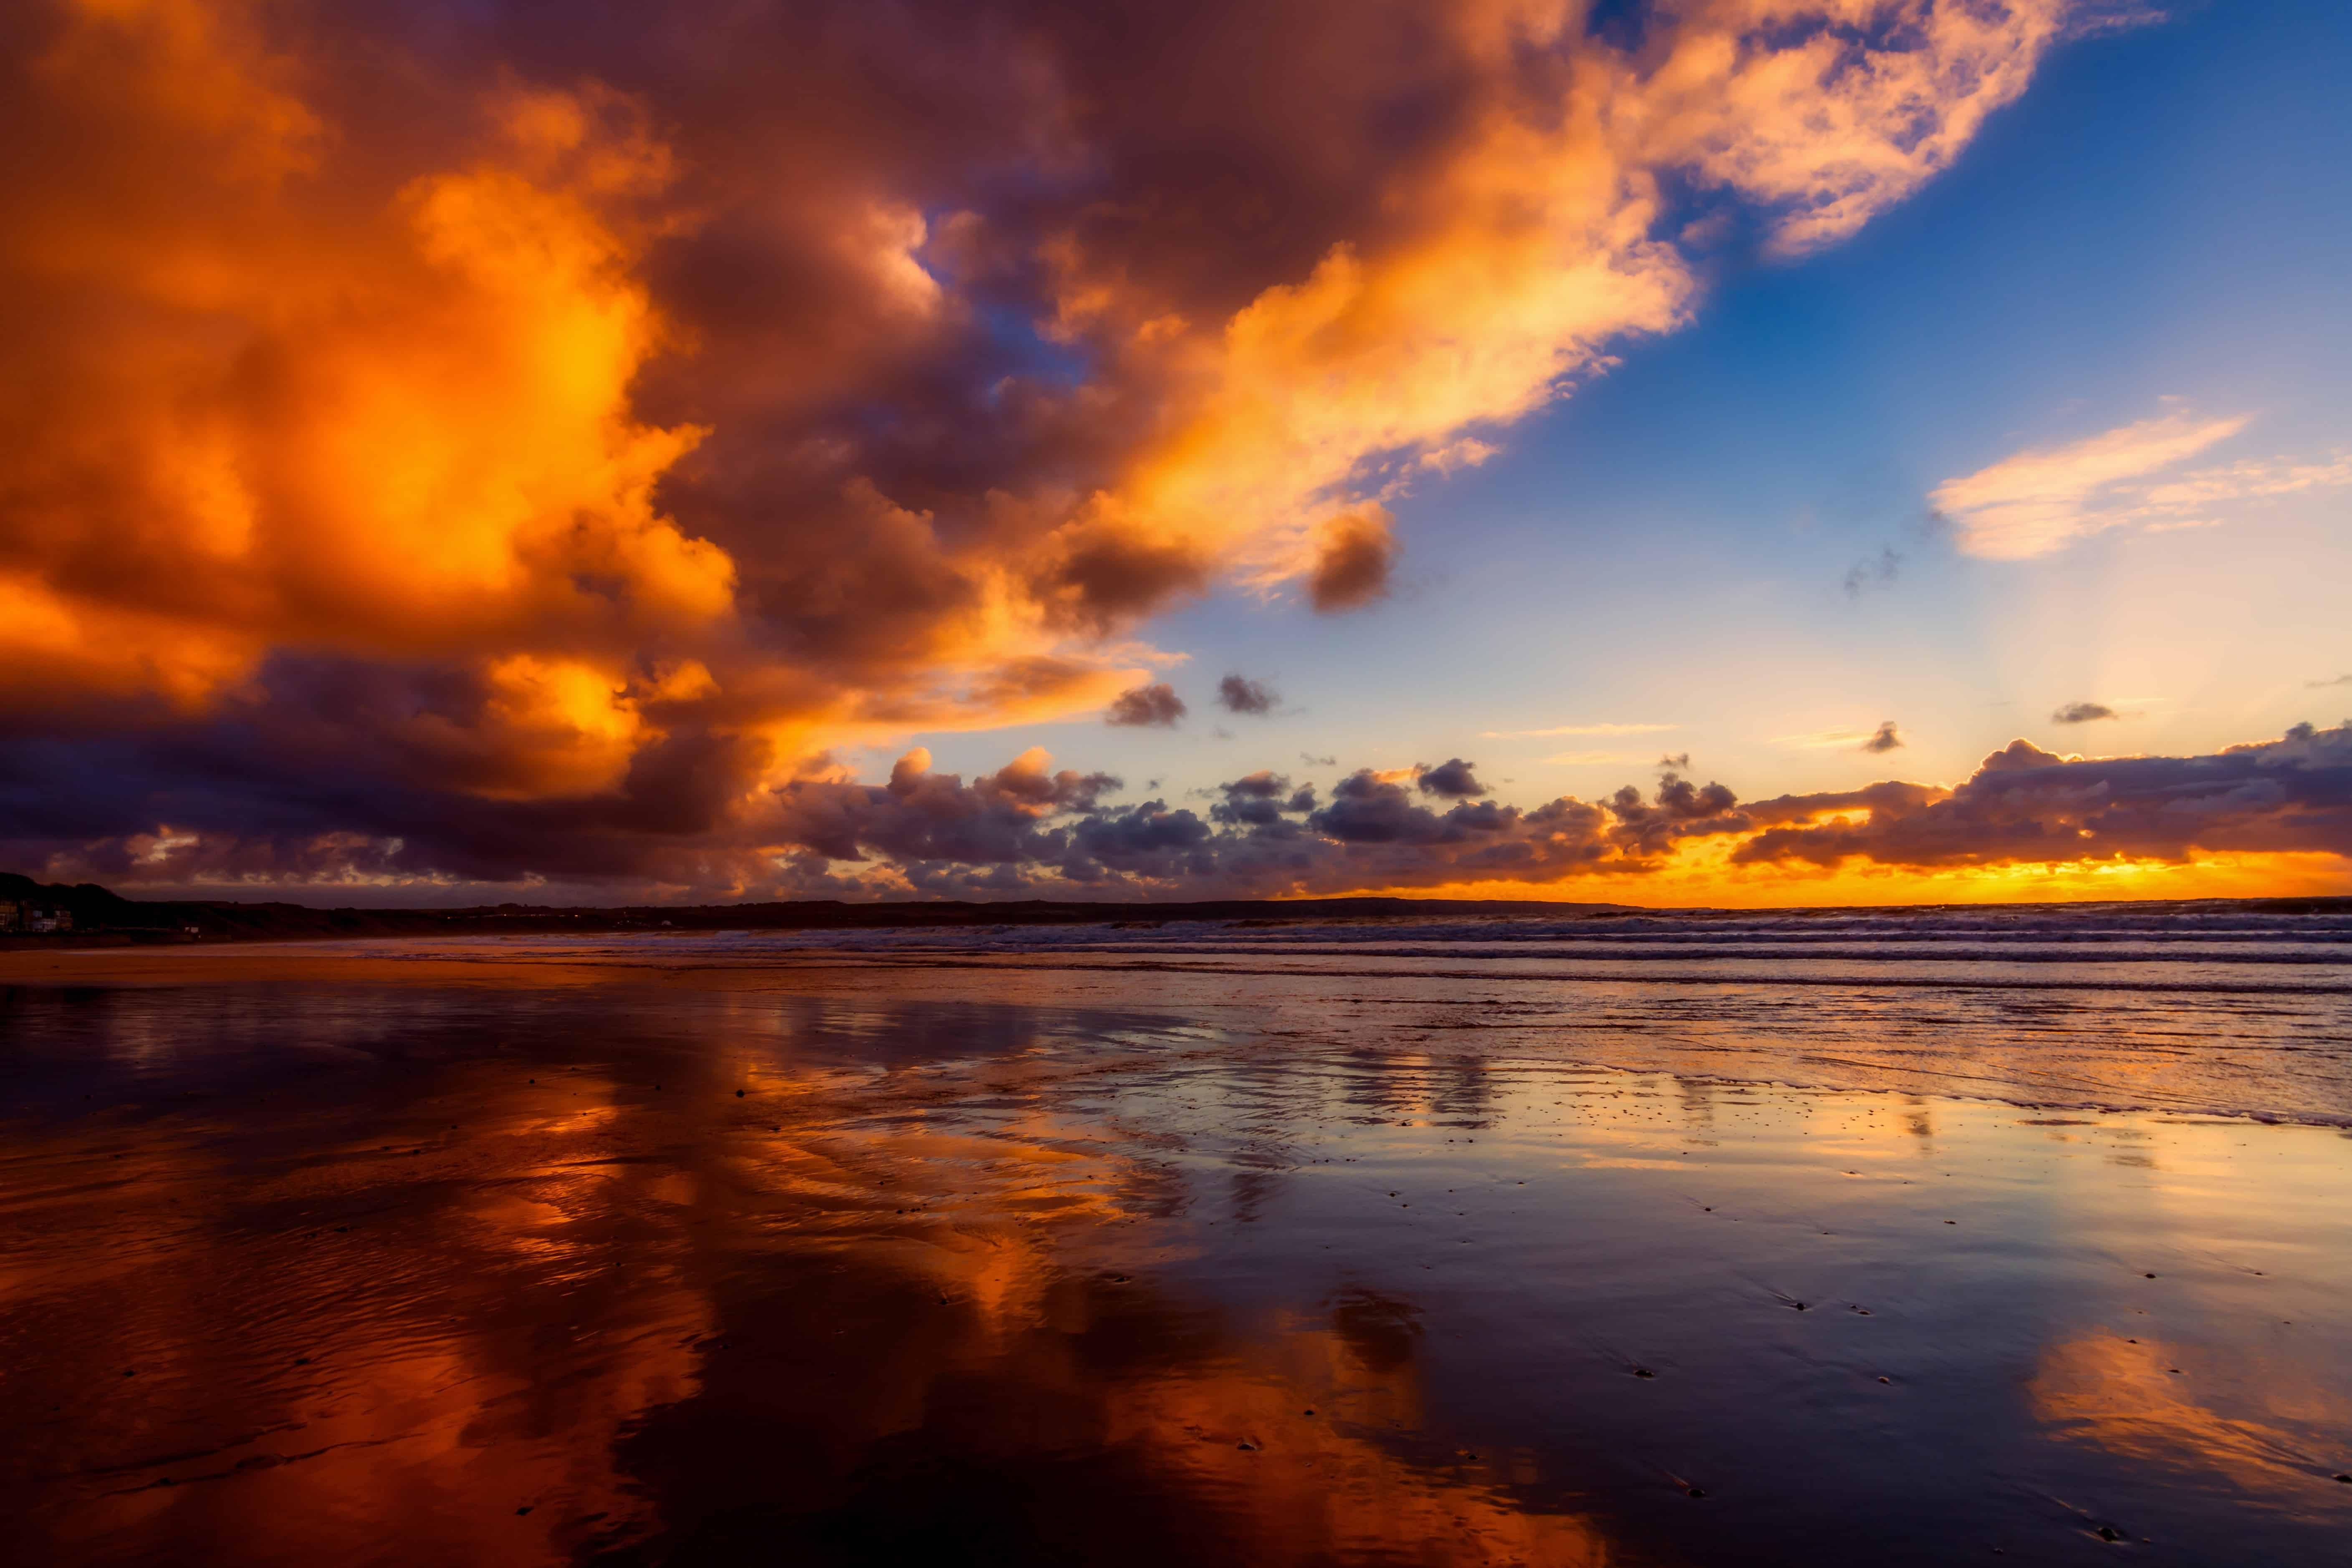 Free picture: water, nature, ocean, sunset, beach, sun, dusk